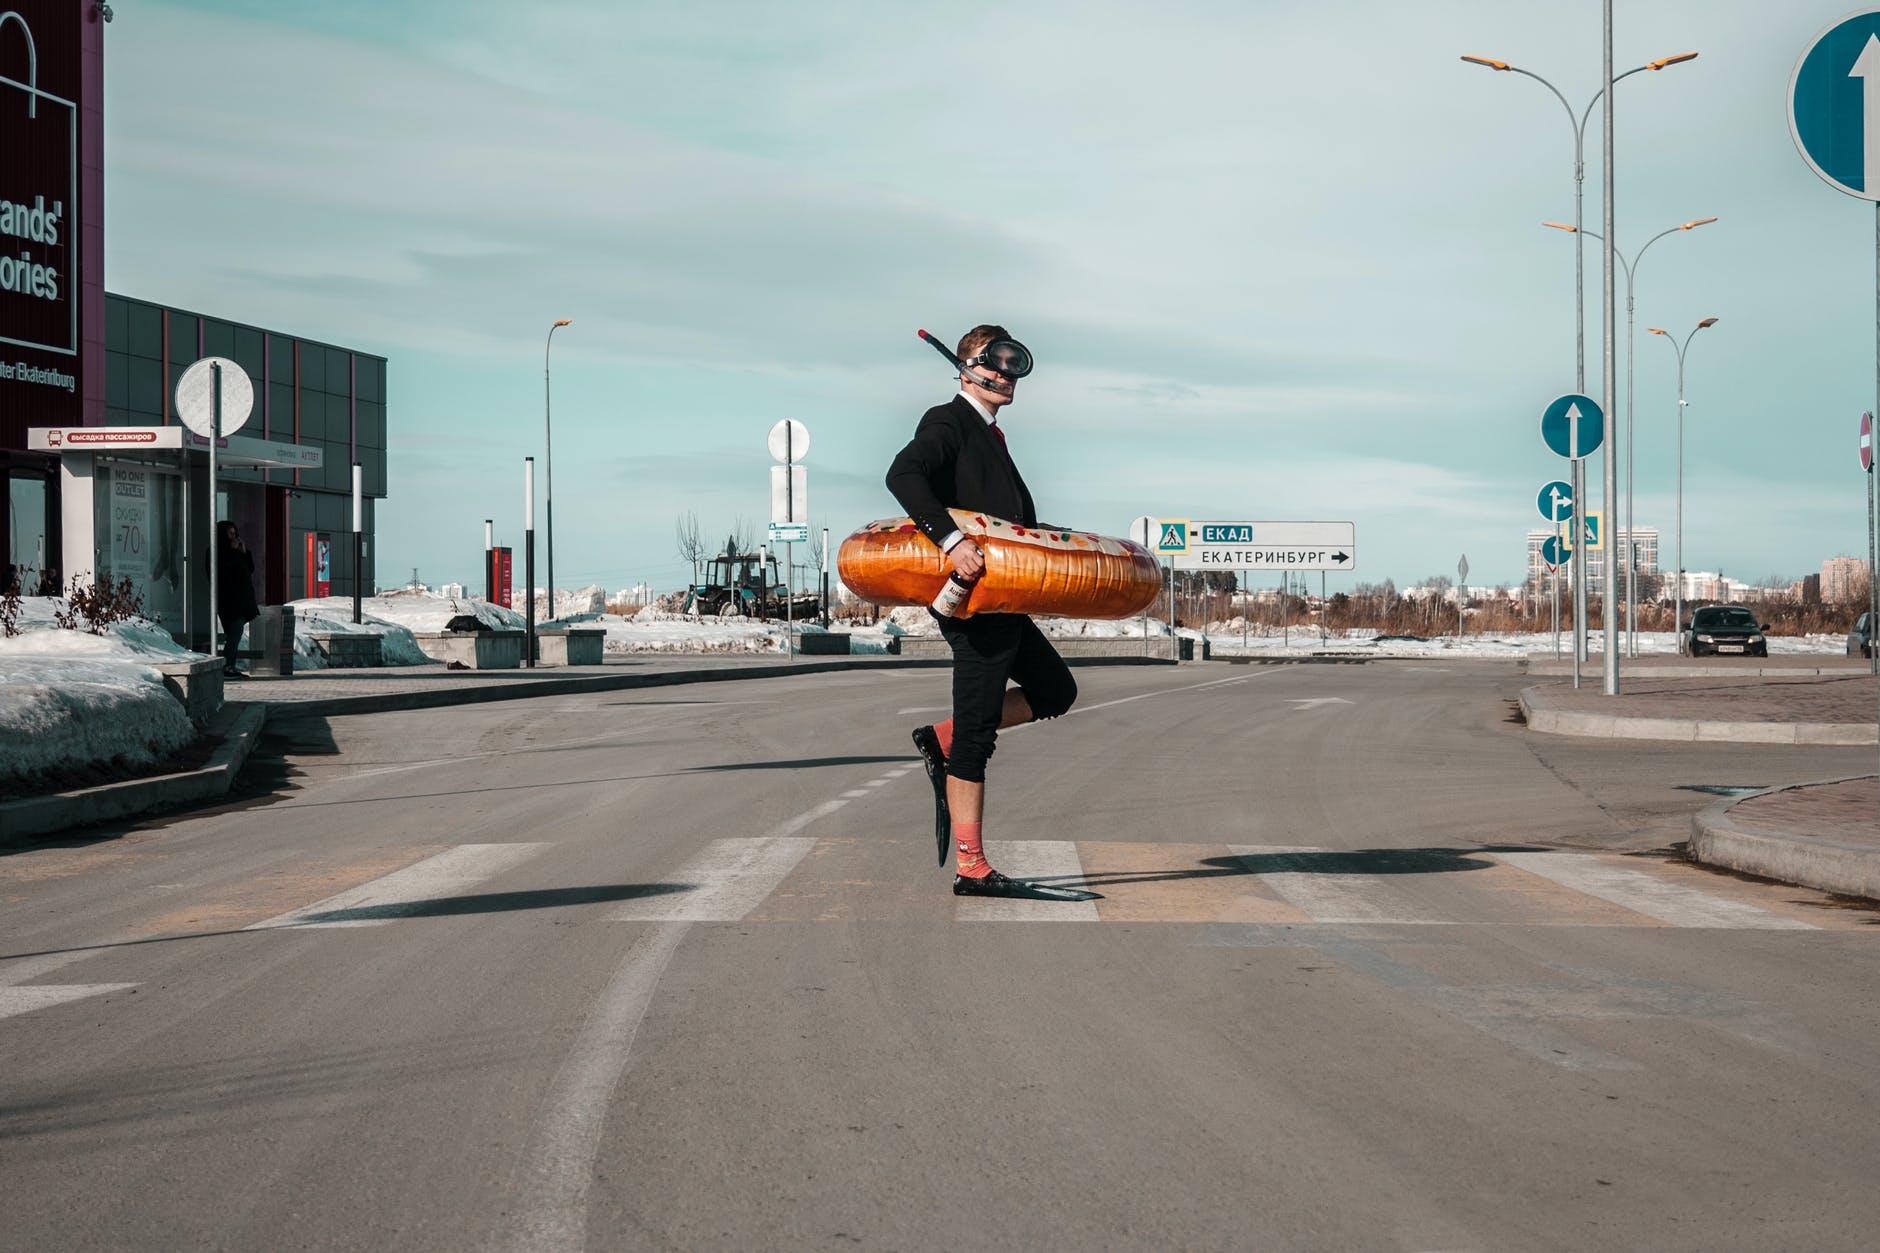 strange man with swimming equipment on street